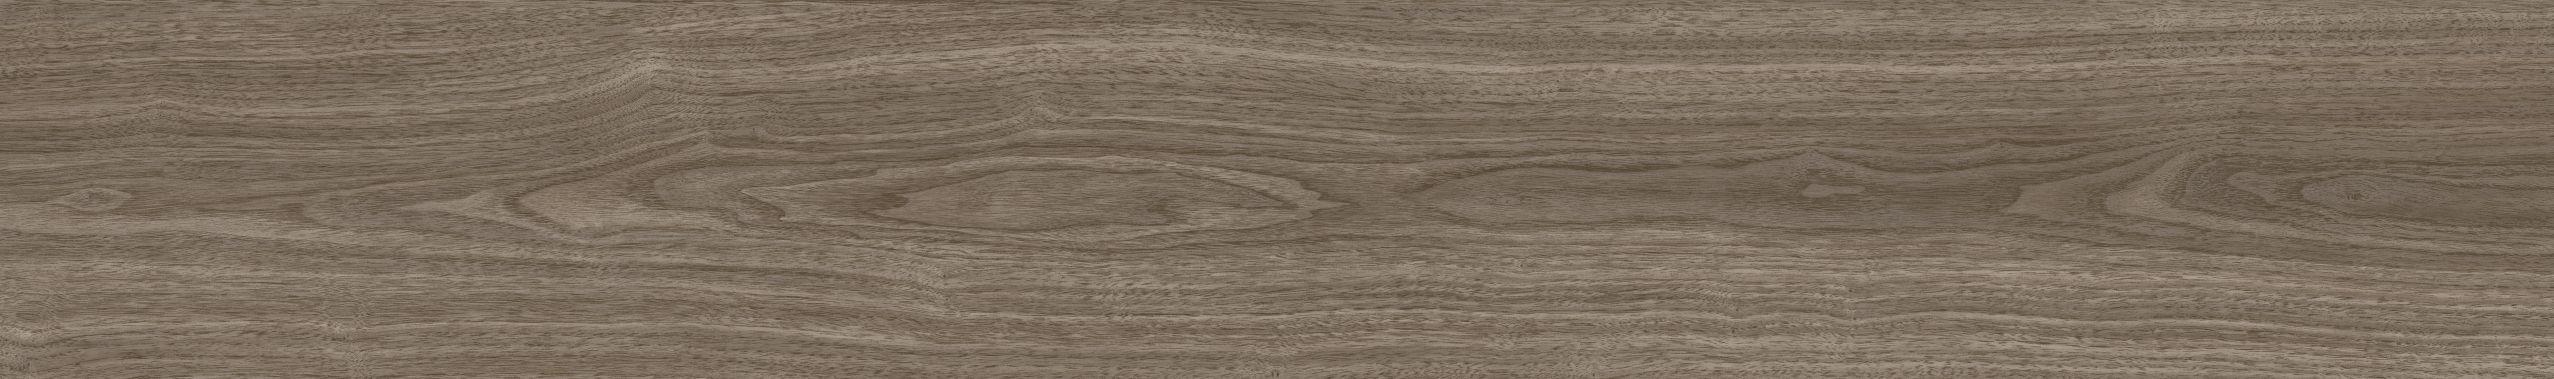 Panele winylowe LVT modulari ® WOOD DRYBACK 19,6 x 132 cm 28843